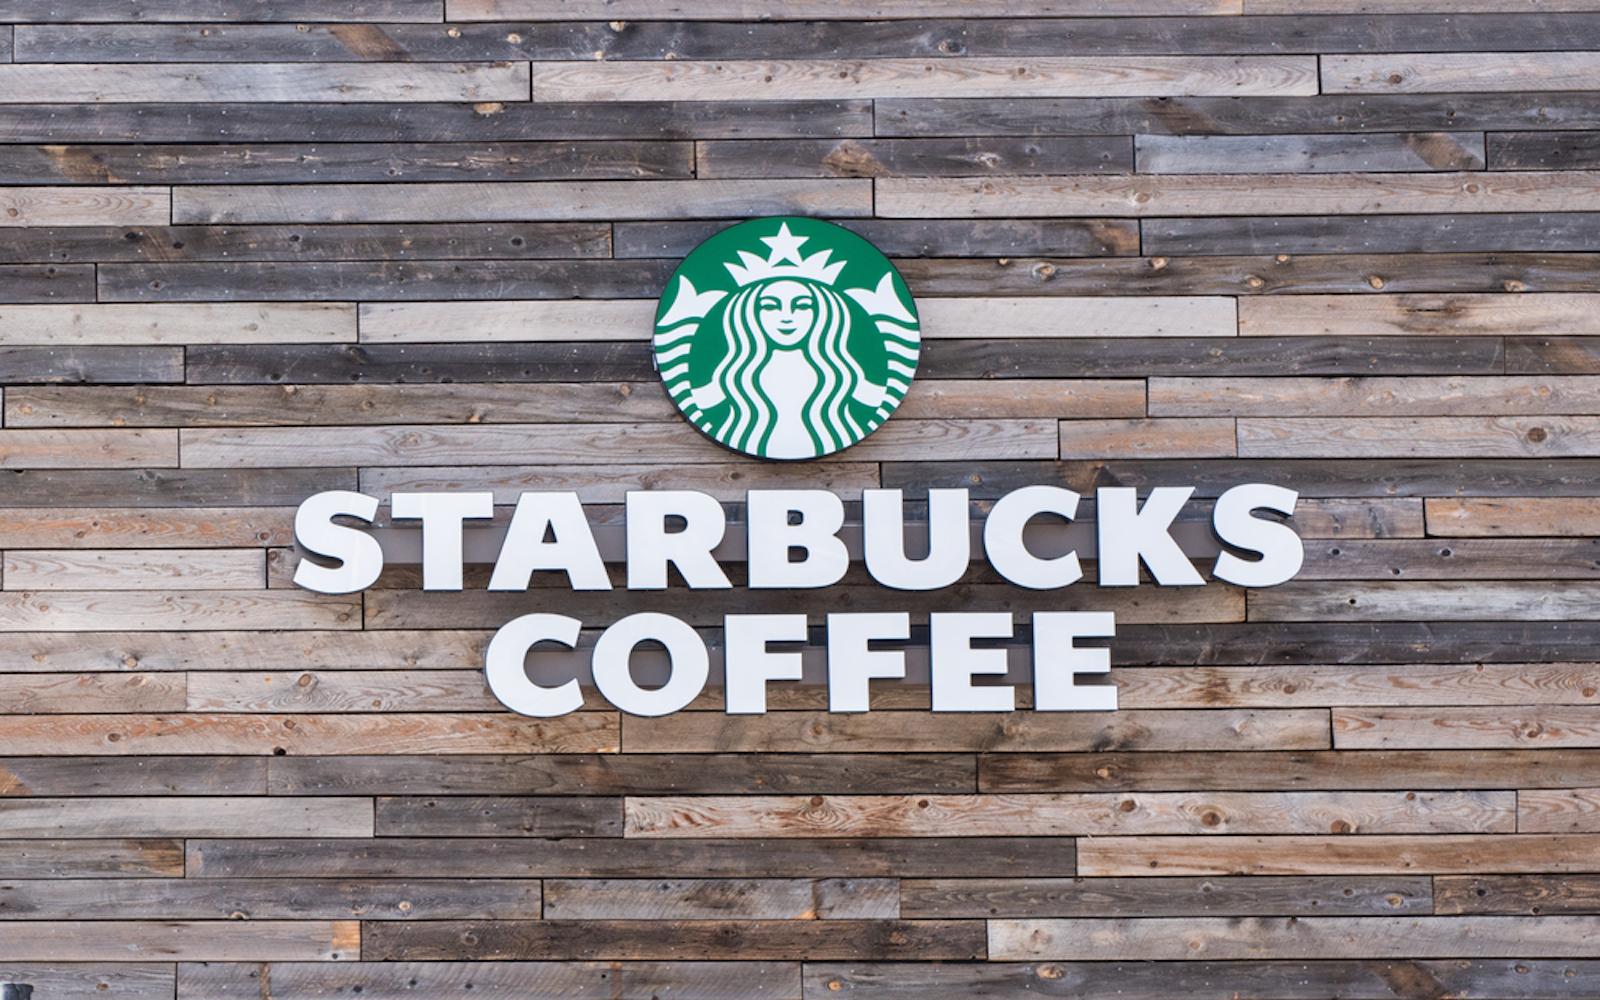 starbucks new plant based coffee